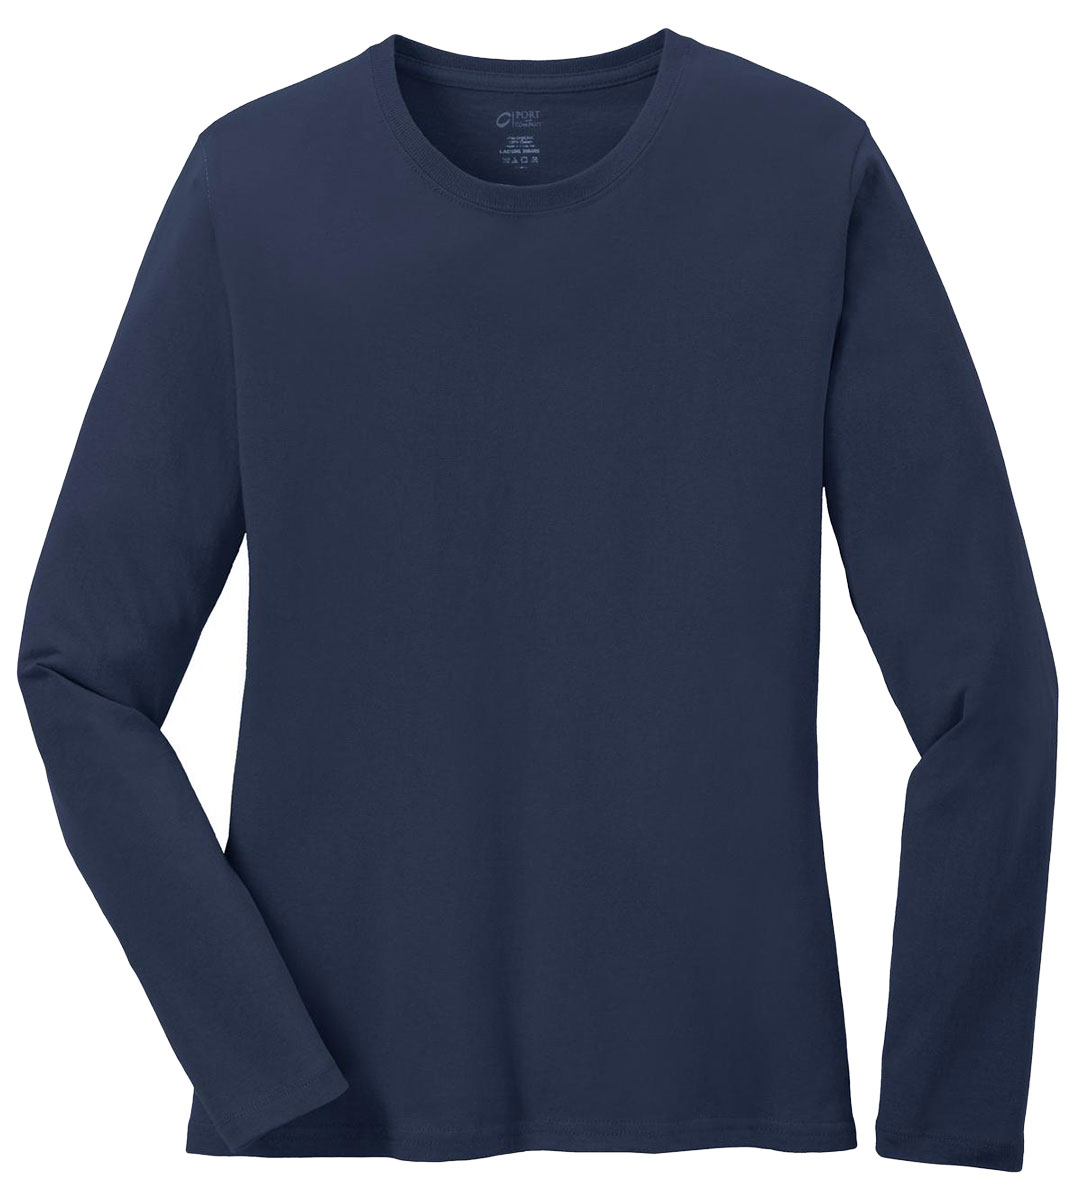 Port Company Women 39 S Long Sleeve 5 4 Oz 100 Cotton T